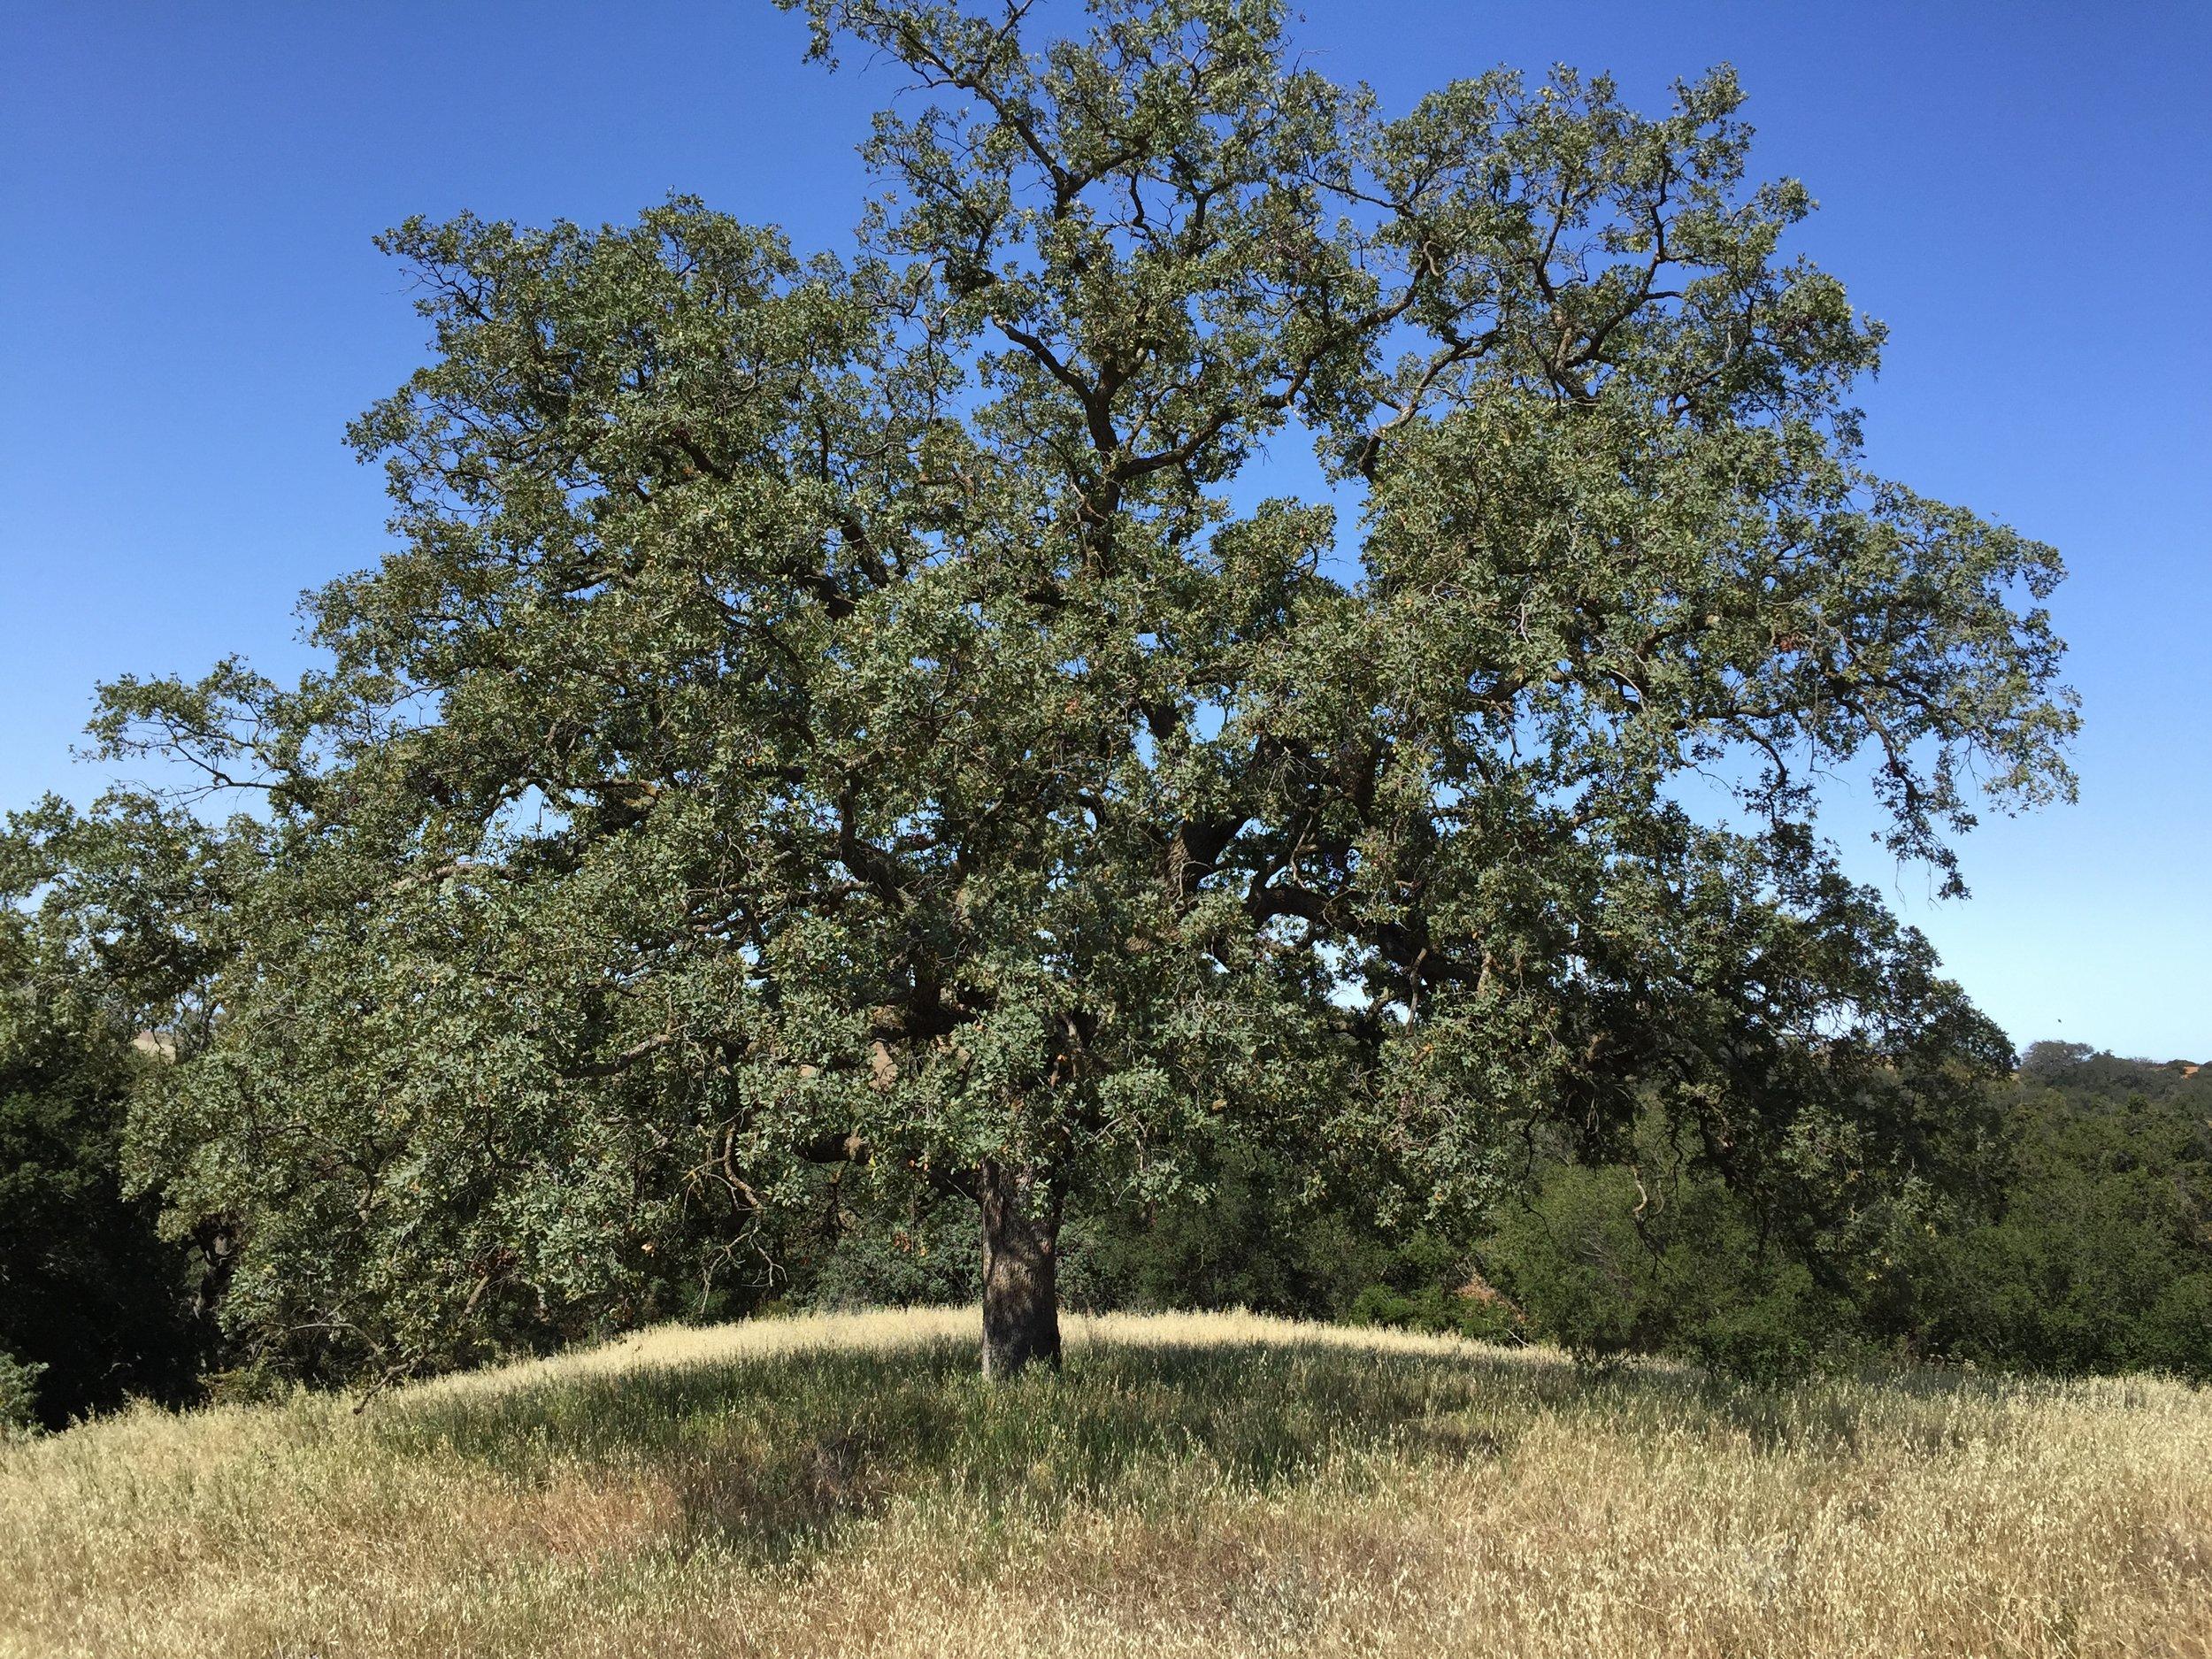 Image of tree in field.